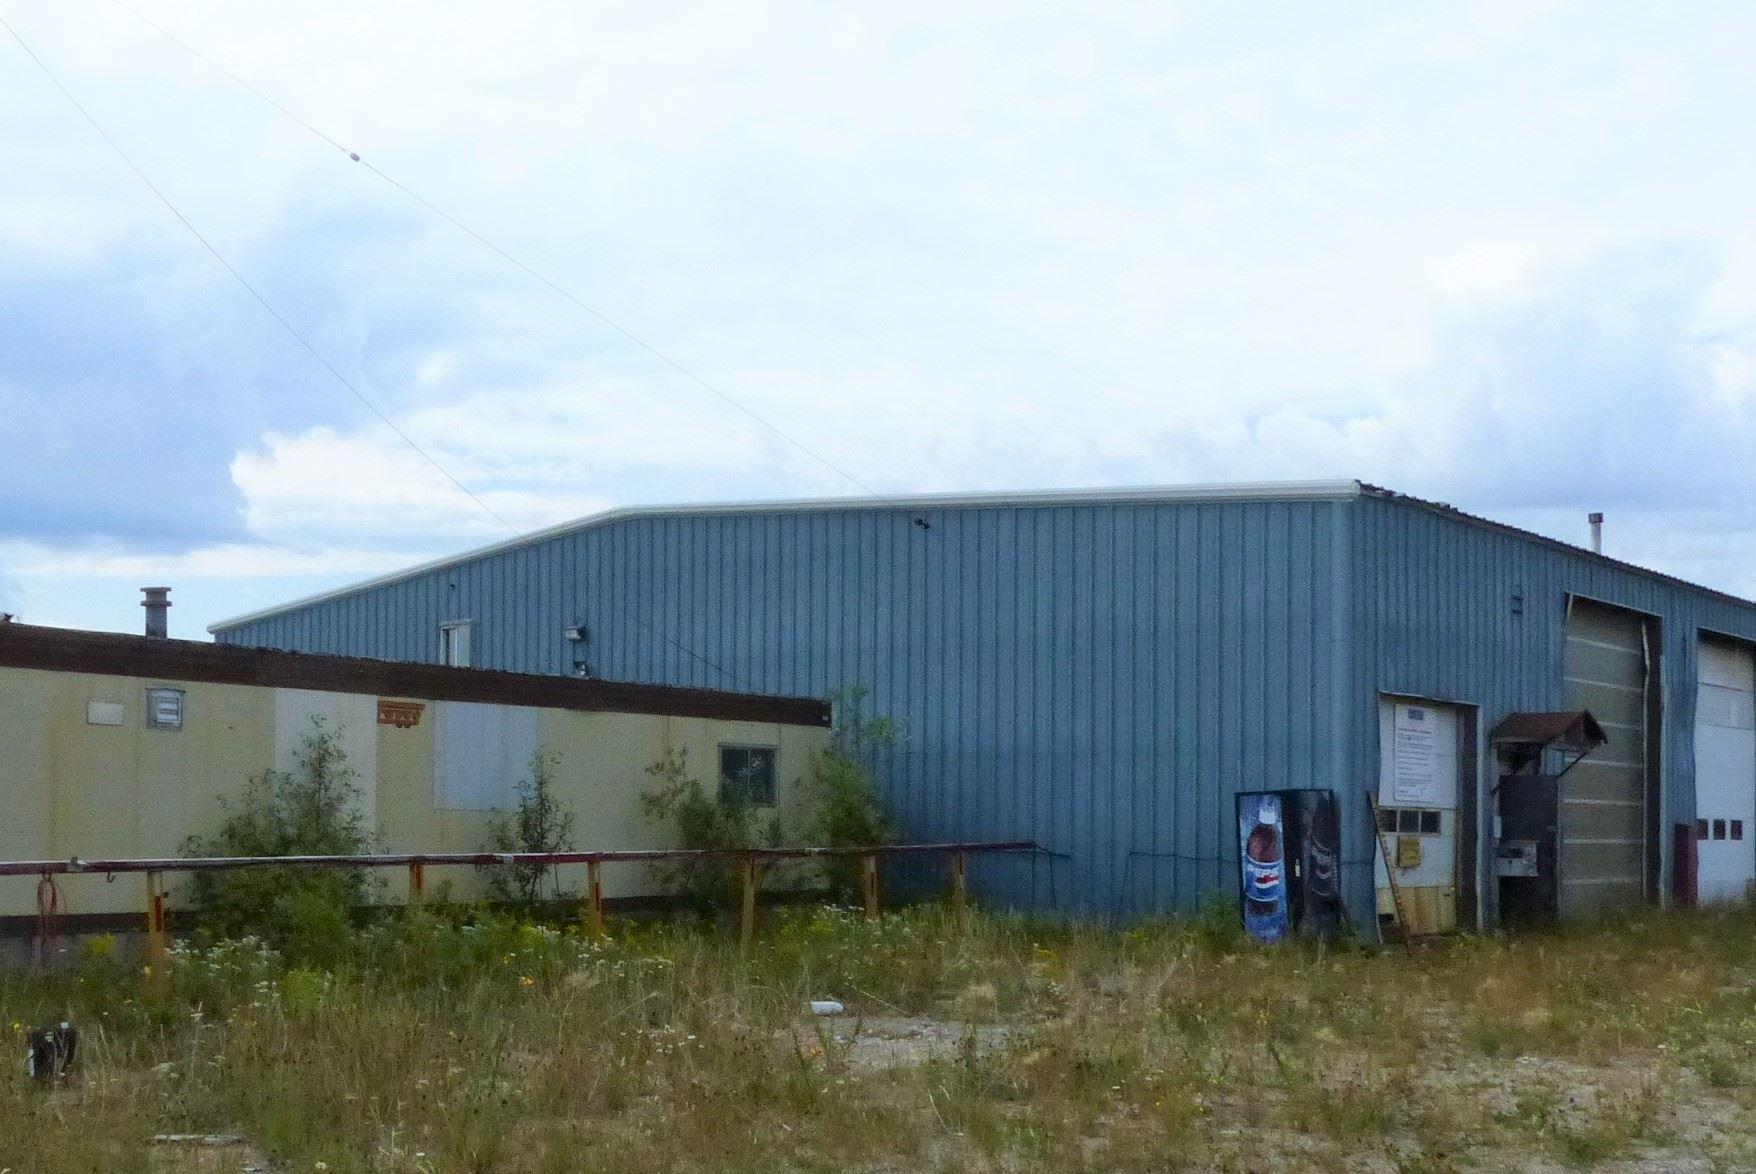 Pcl 24259 Caramat Industrial, Manitouwadge Ontario, Canada